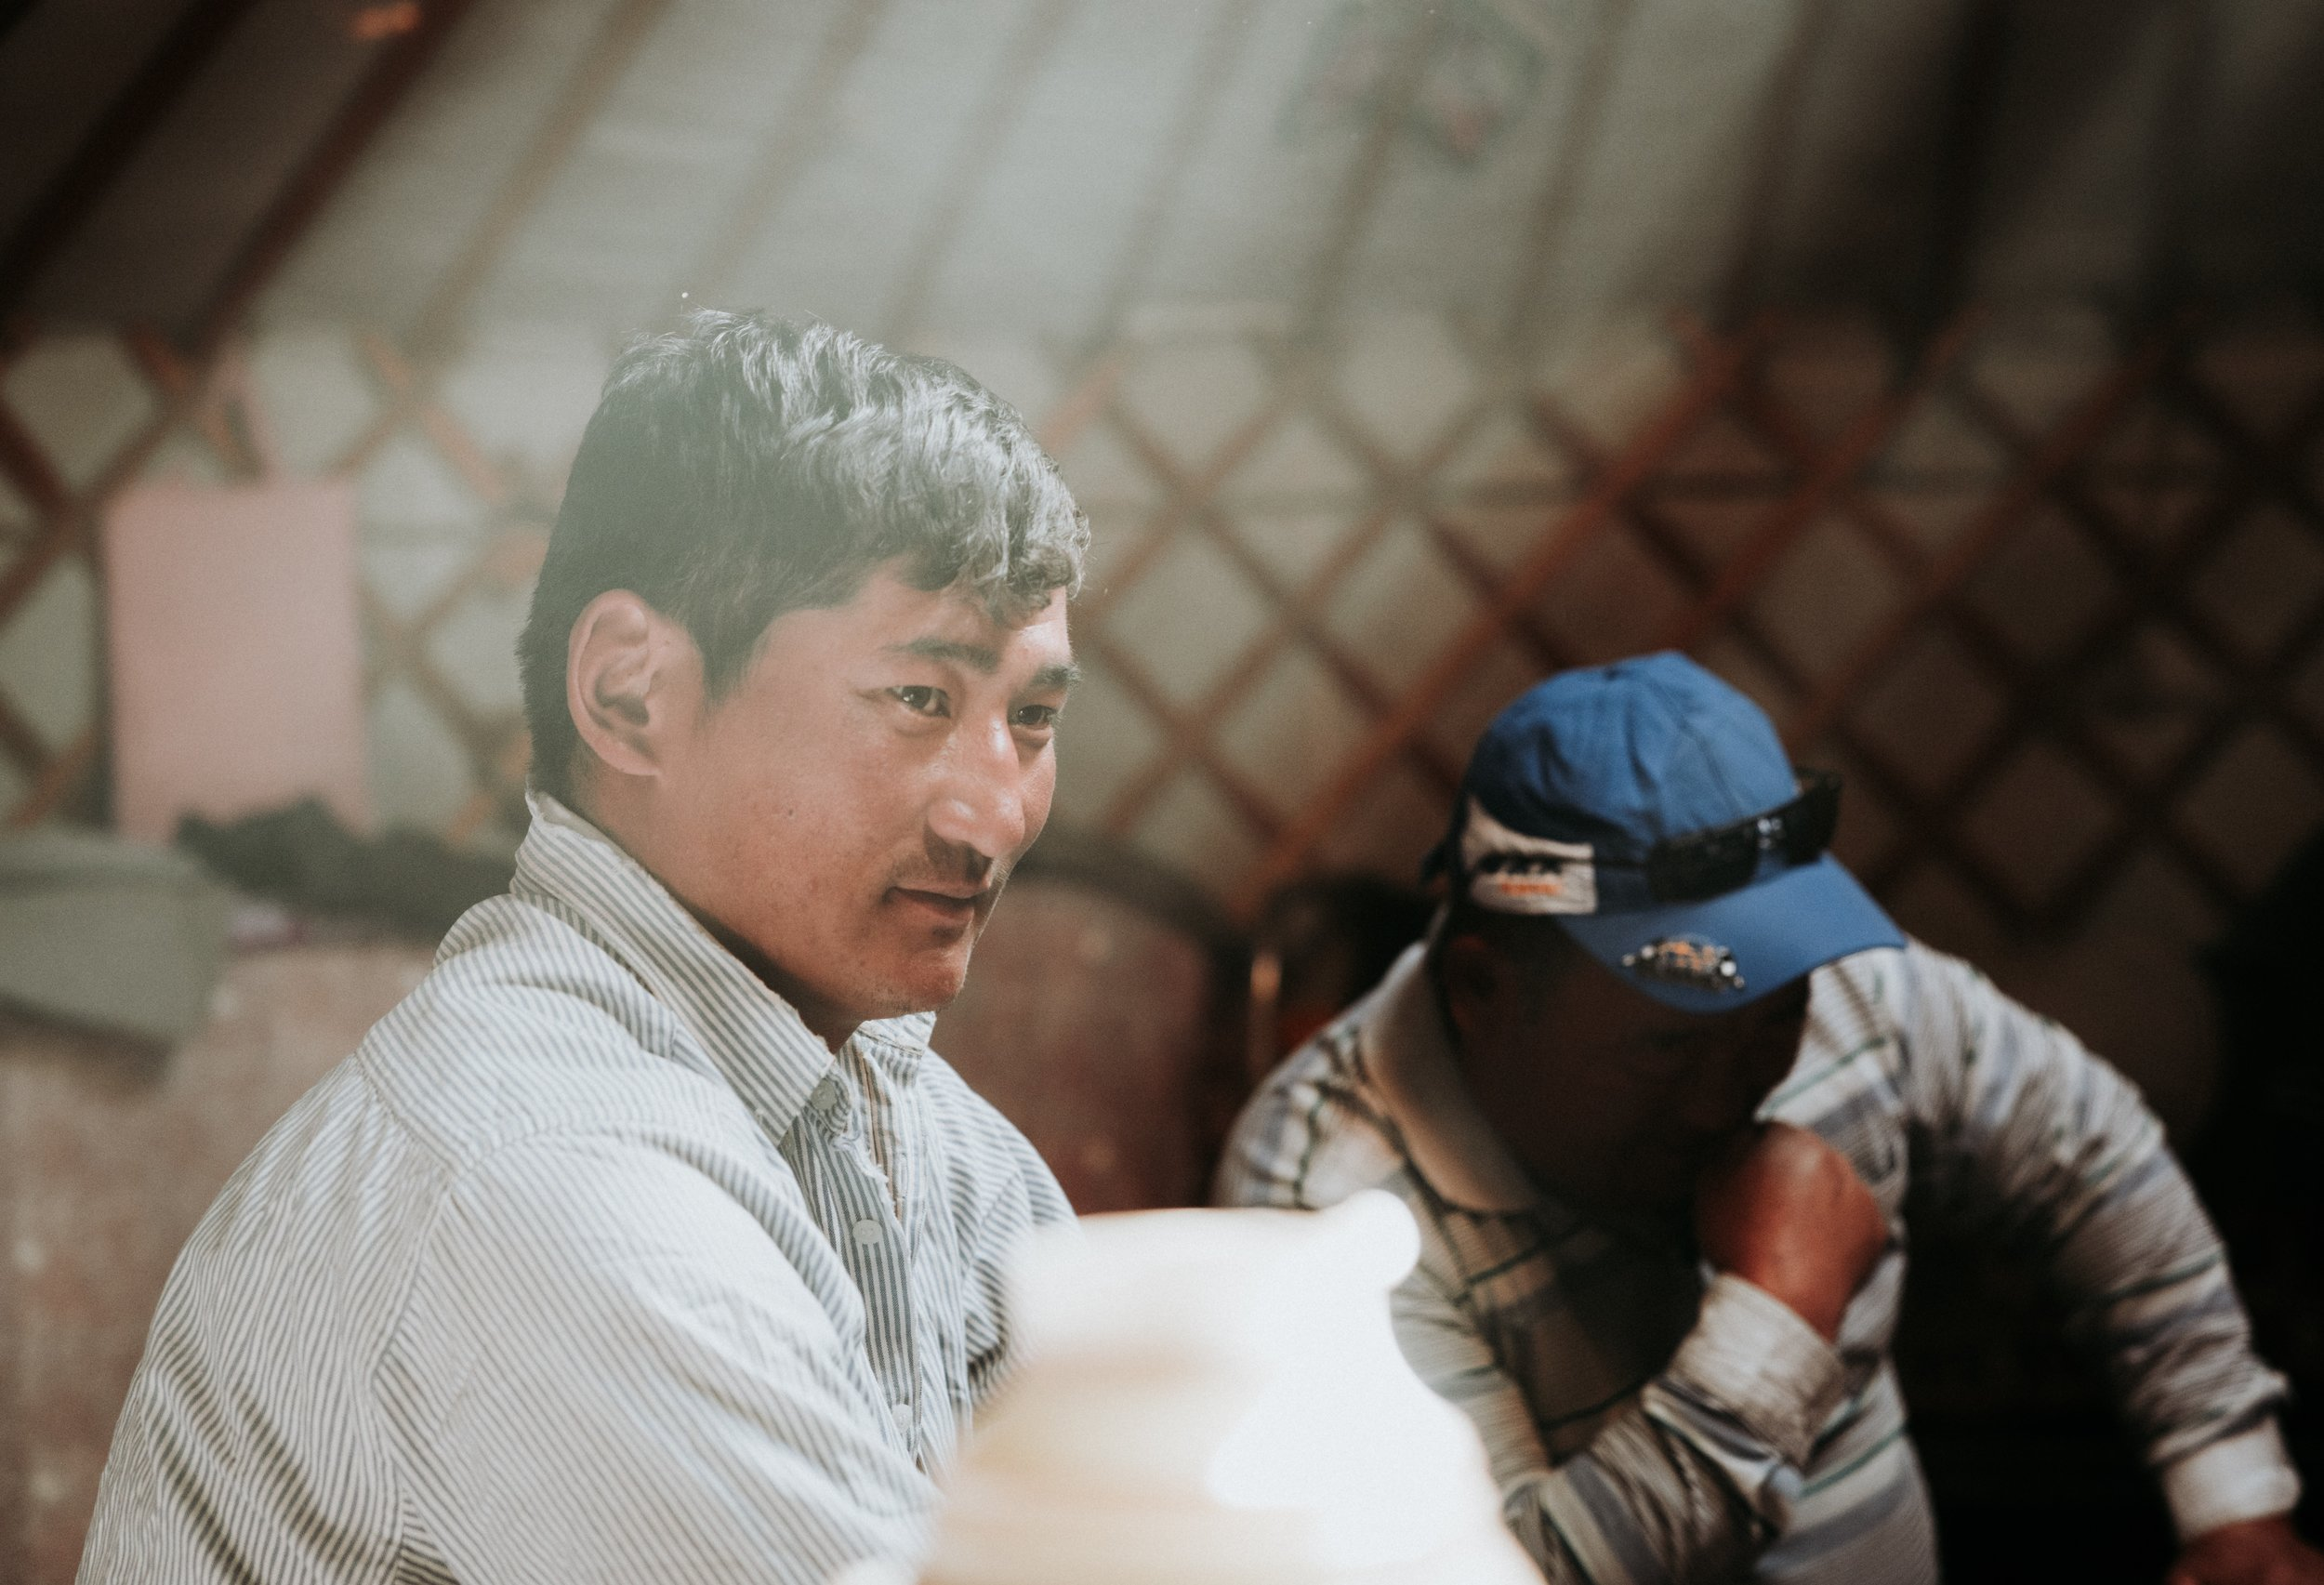 Mongolia_2018 (209 of 403) copy.jpg